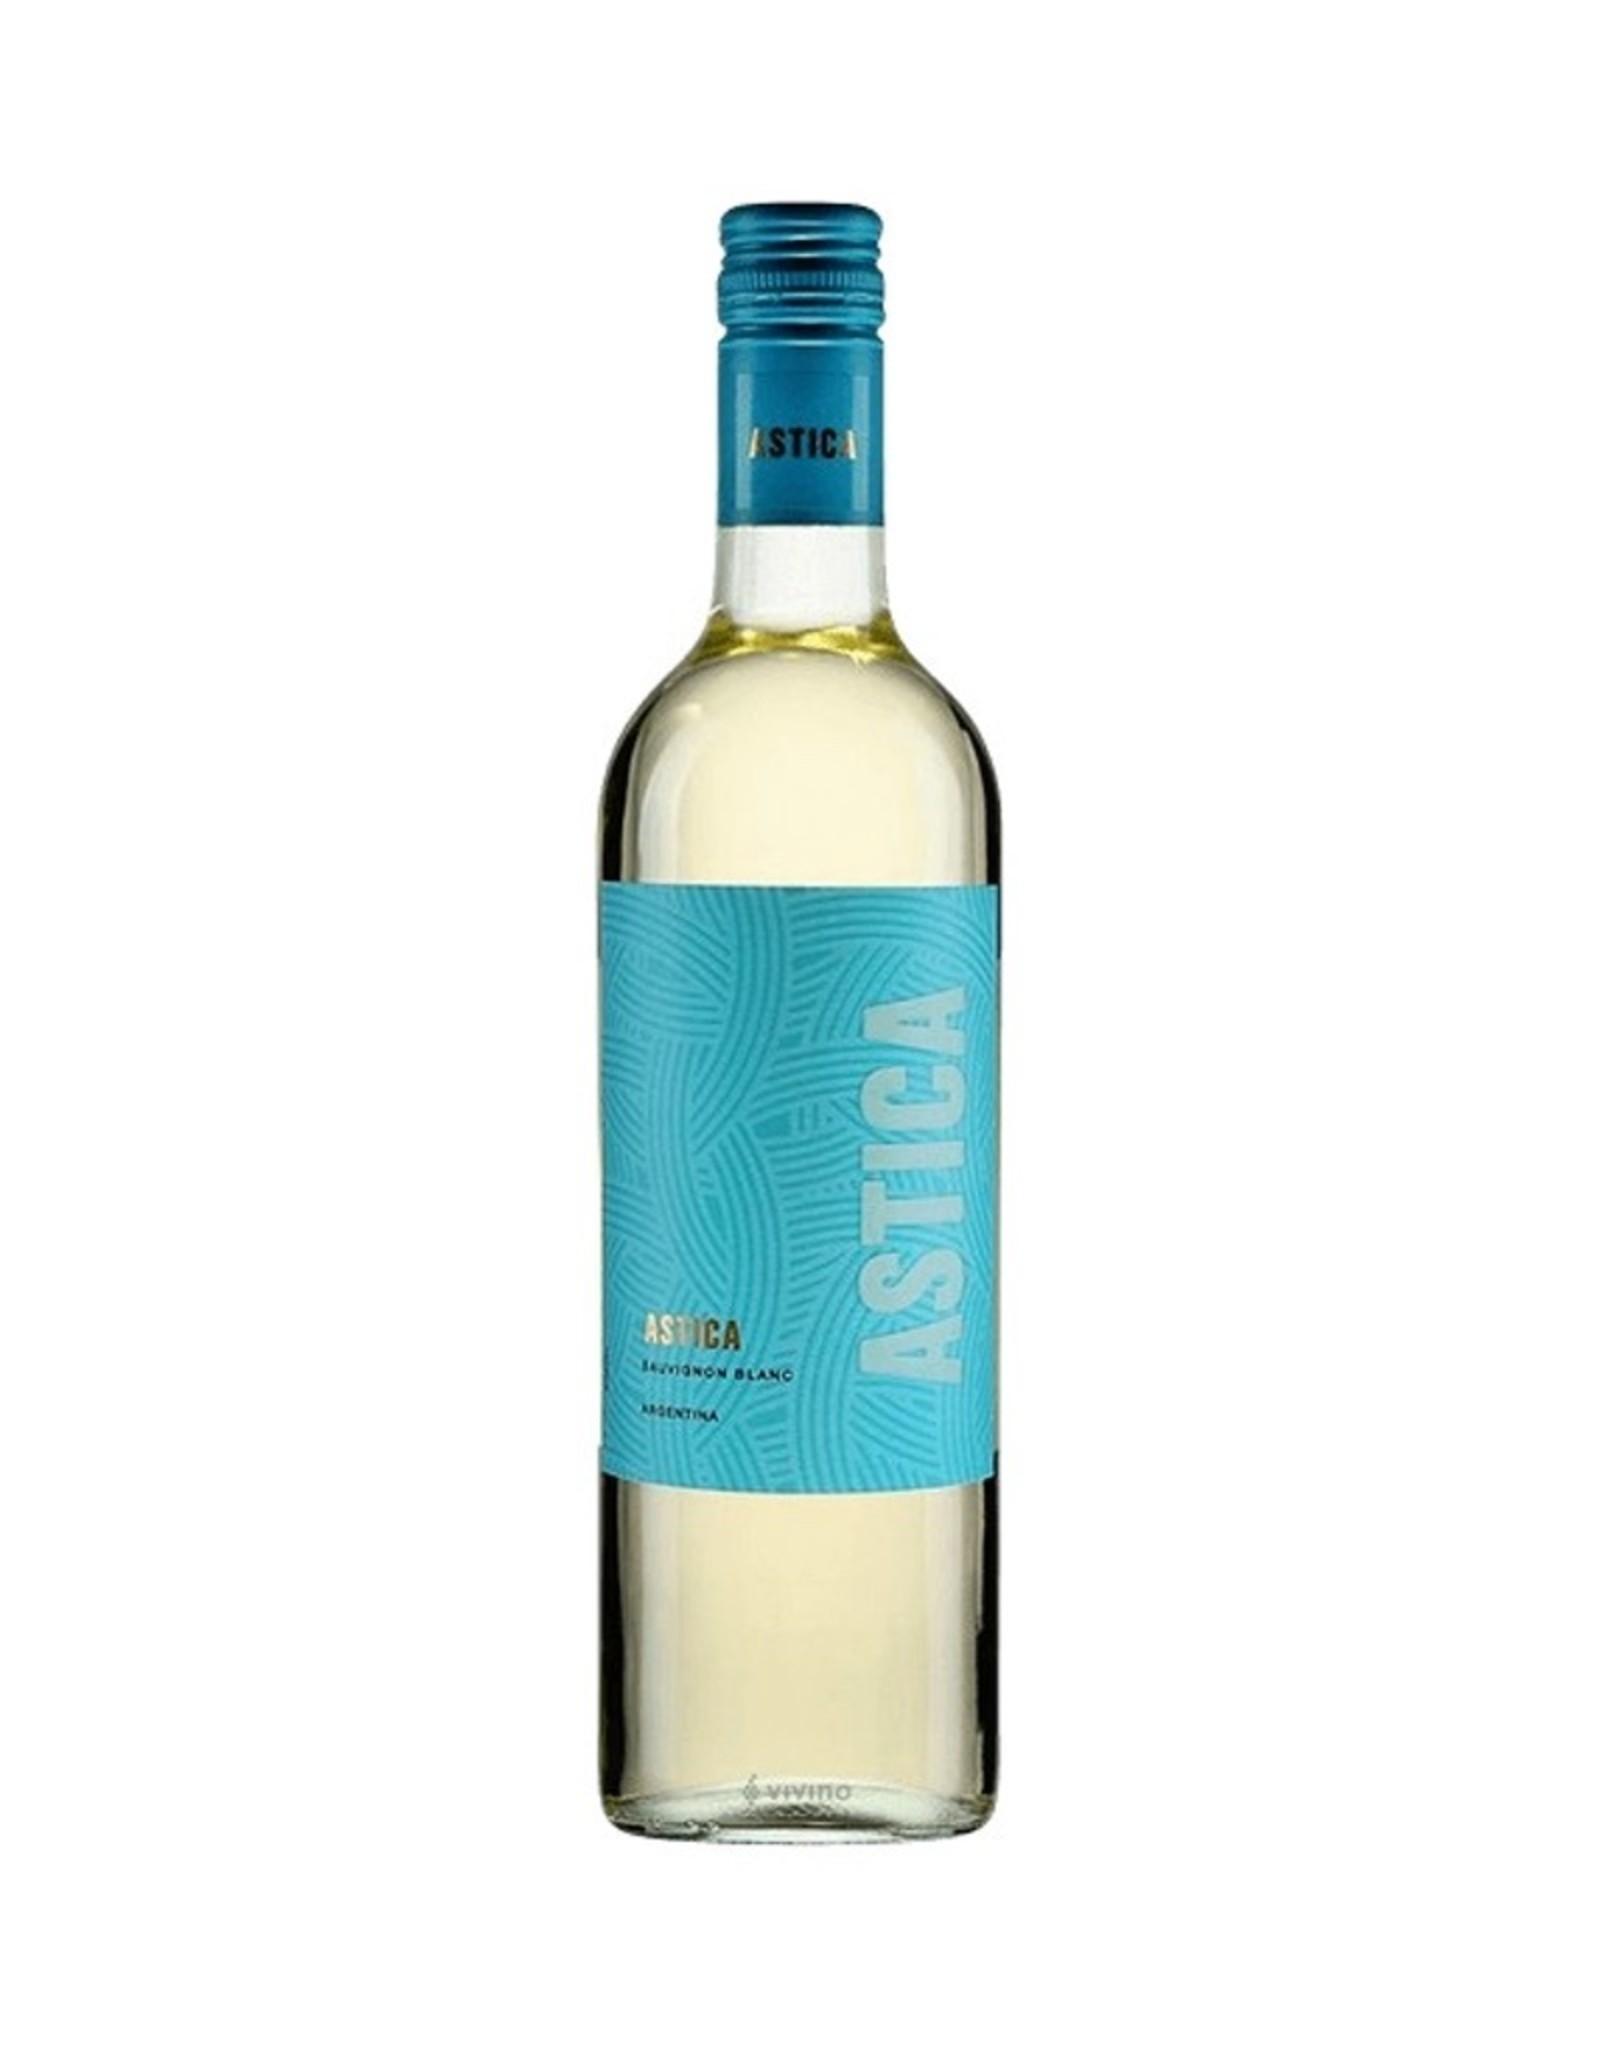 Astica Argentina Sauvignon Blanc 2019